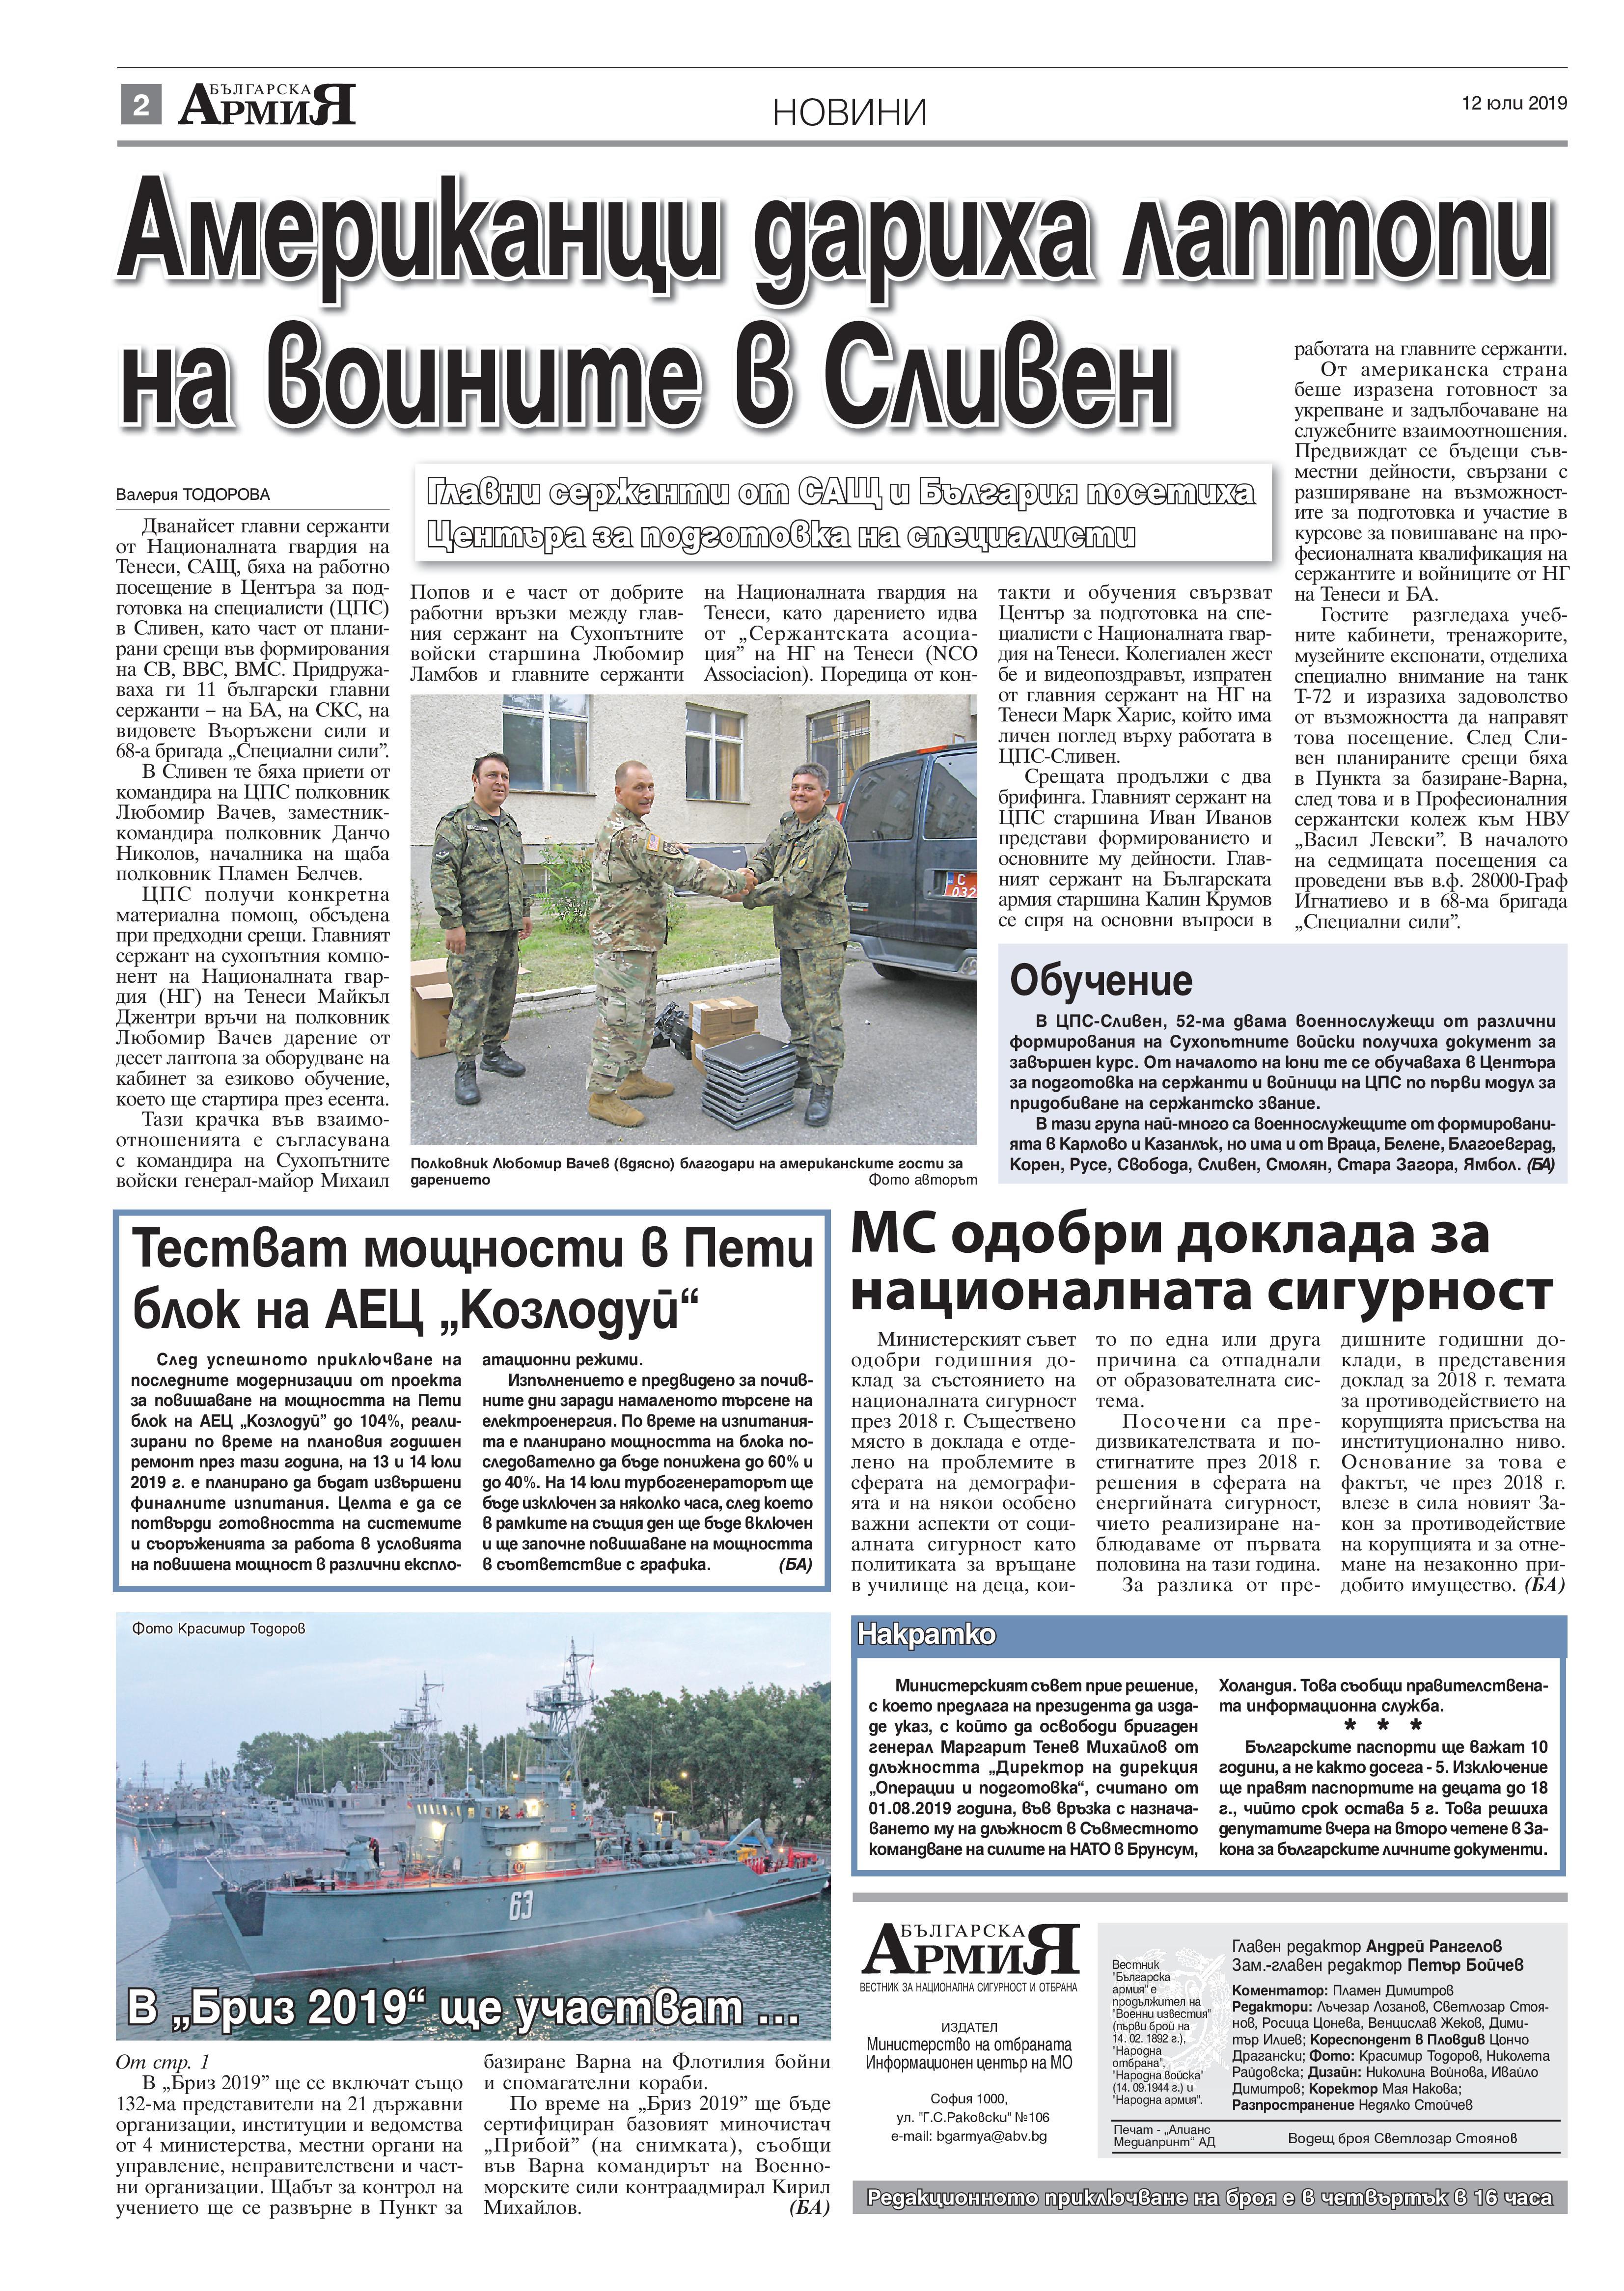 https://armymedia.bg/wp-content/uploads/2015/06/02-28.jpg